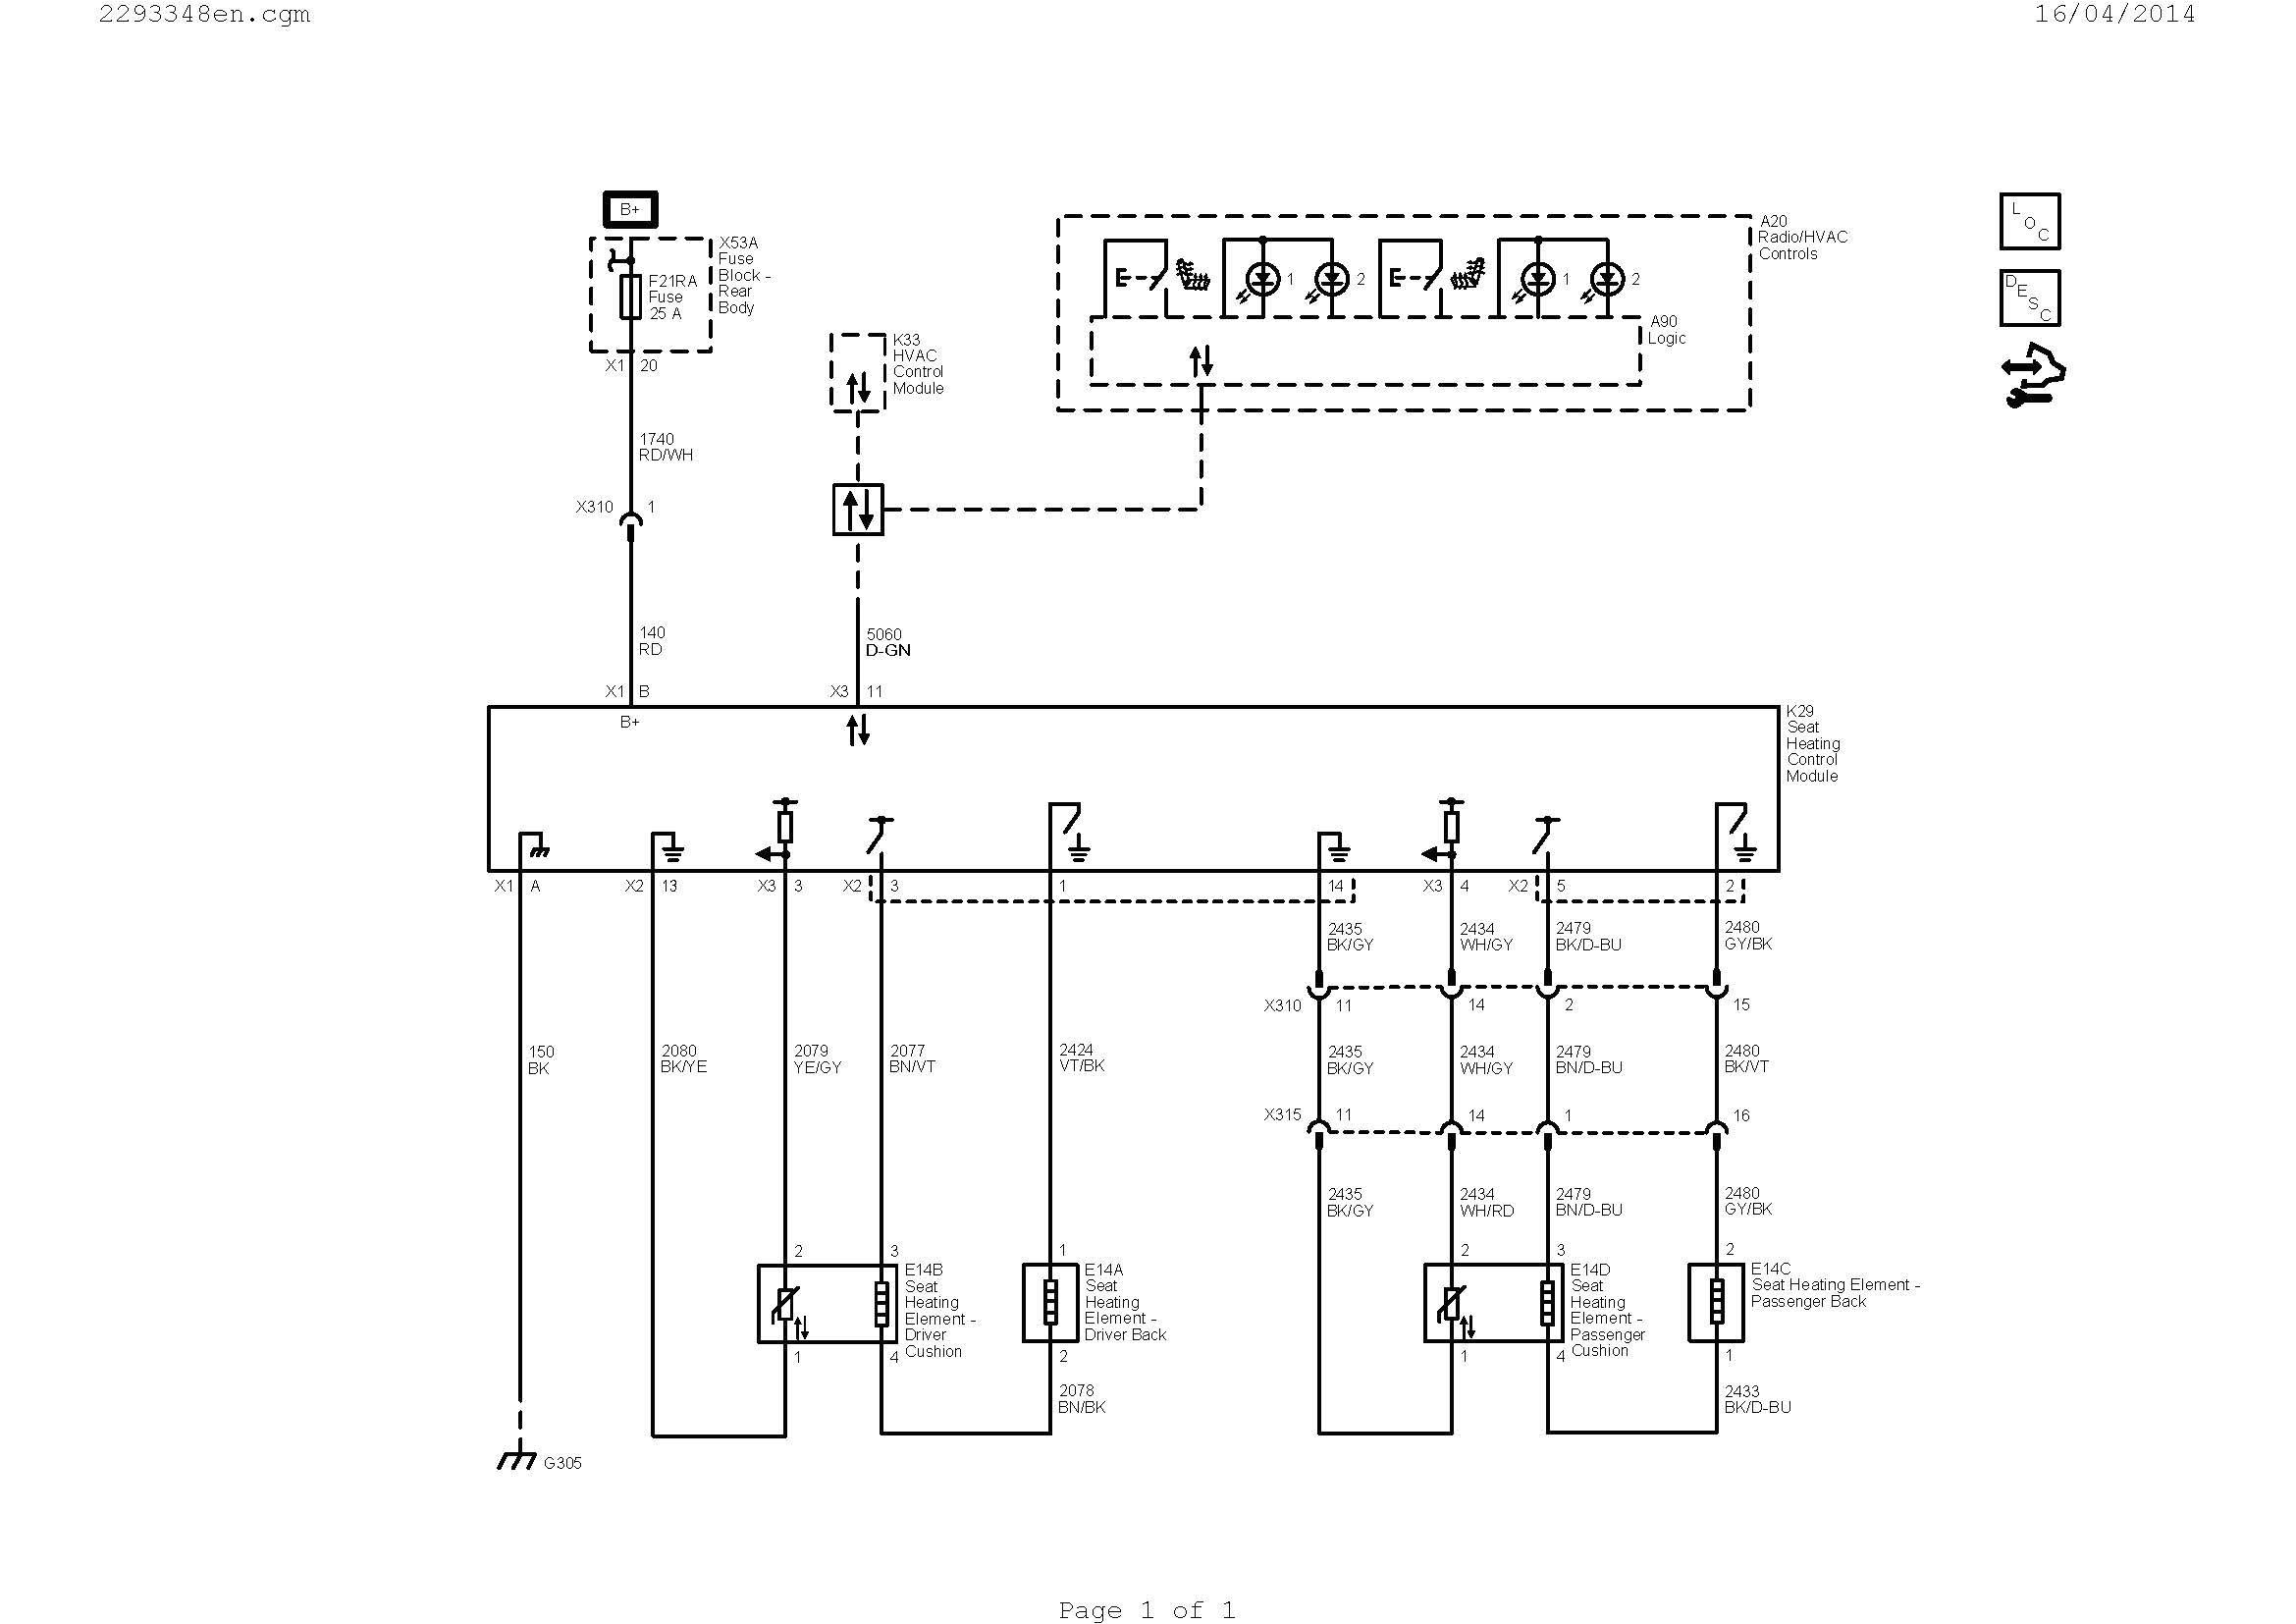 truck wiring diagram wiring diagram schematic new wiring diagram guitar fresh hvac diagram best hvac diagram 0d 2j jpg